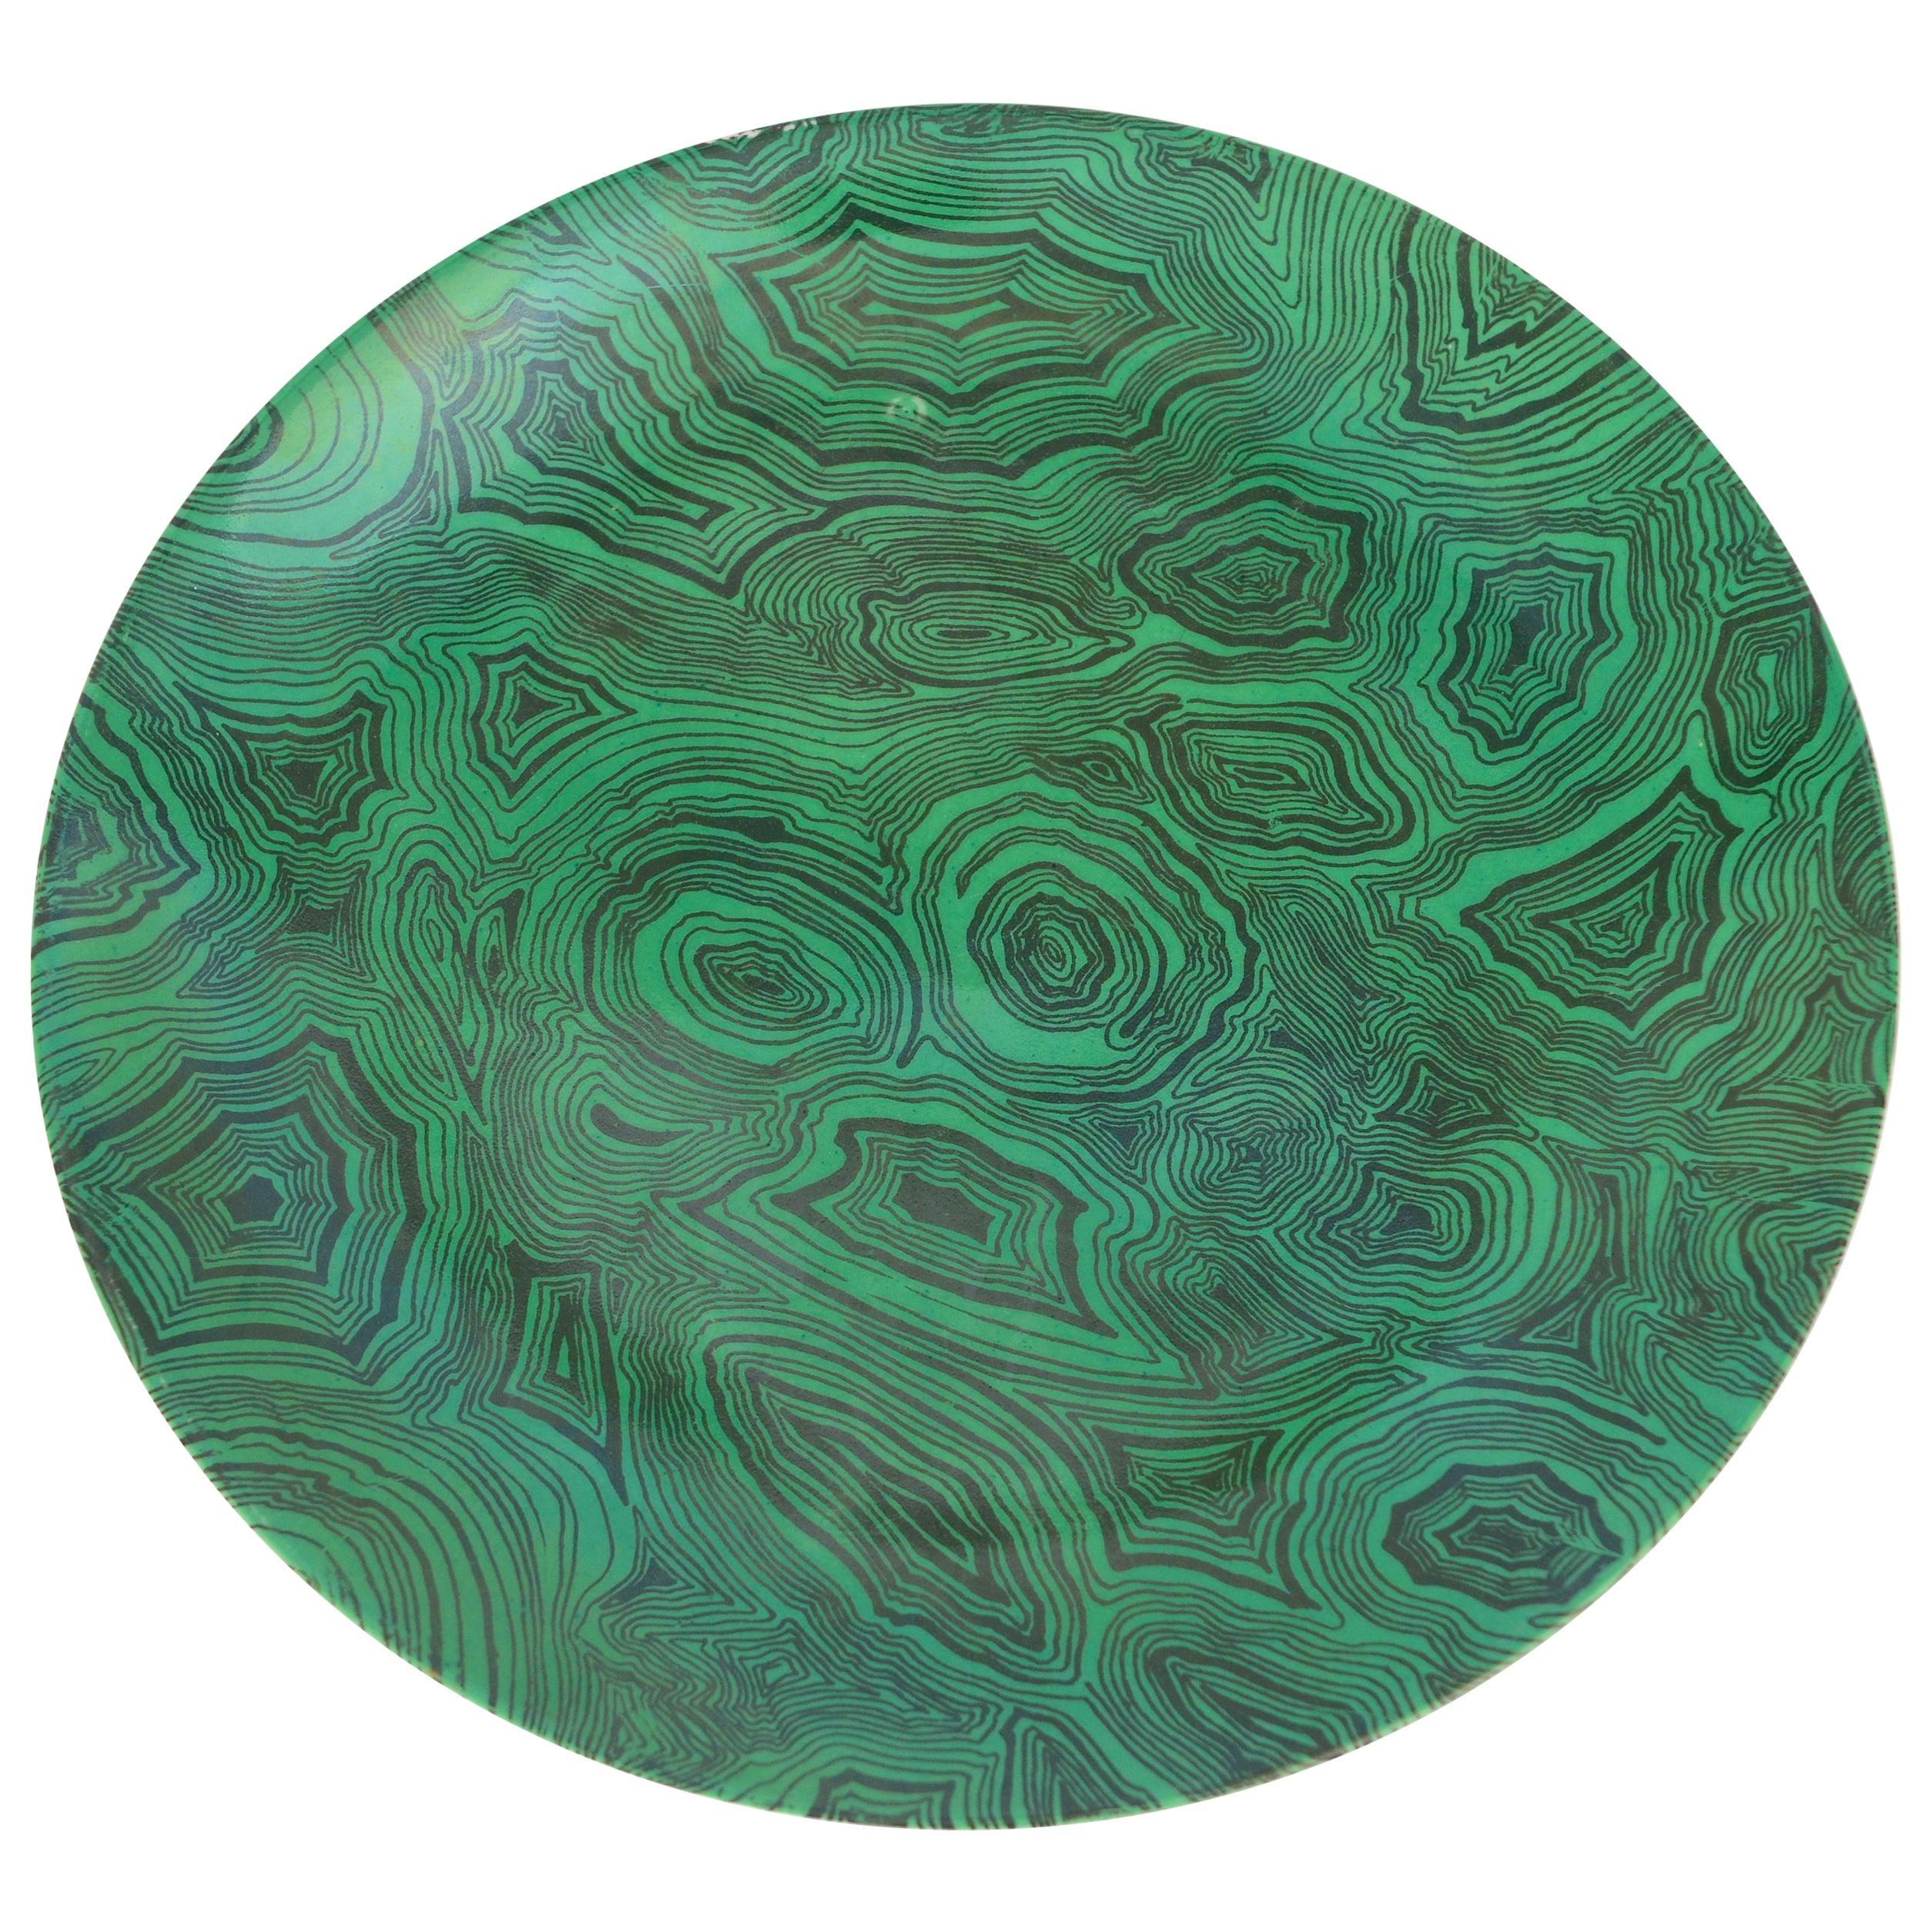 Vintage Piero Fornasetti Green Faux Malachite Plate, circa 1950